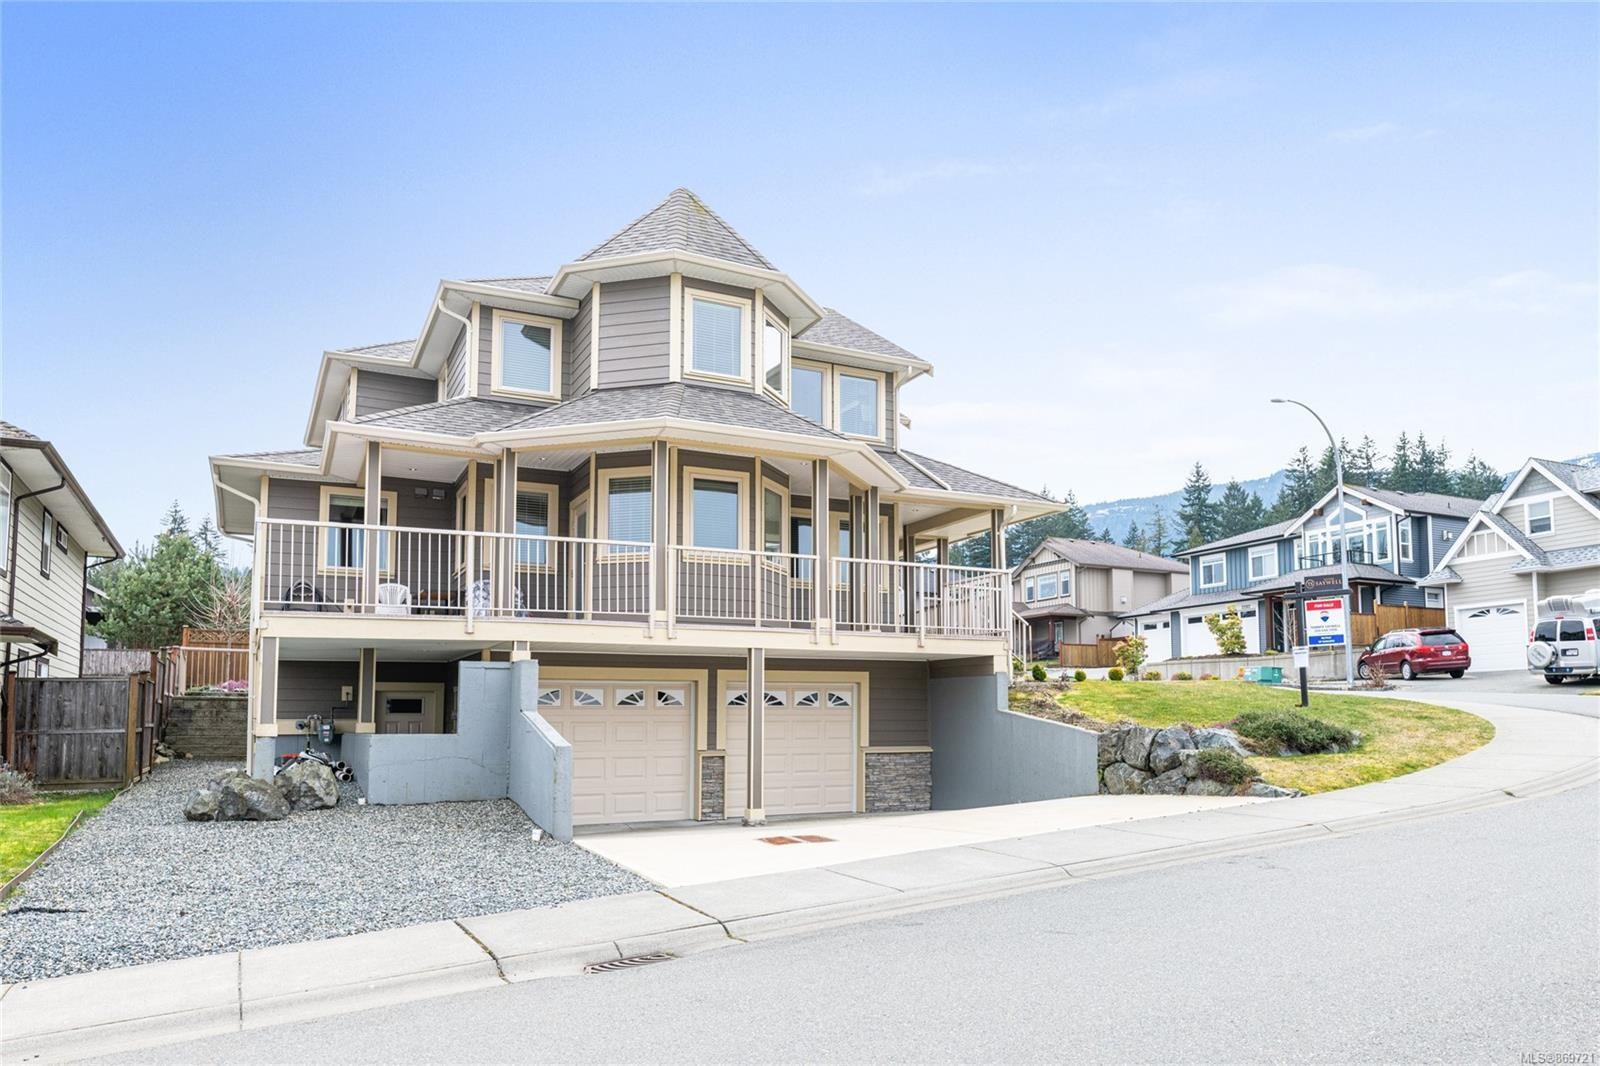 Photo 4: Photos: 2259 Leighton Rd in : Na South Jingle Pot House for sale (Nanaimo)  : MLS®# 869721